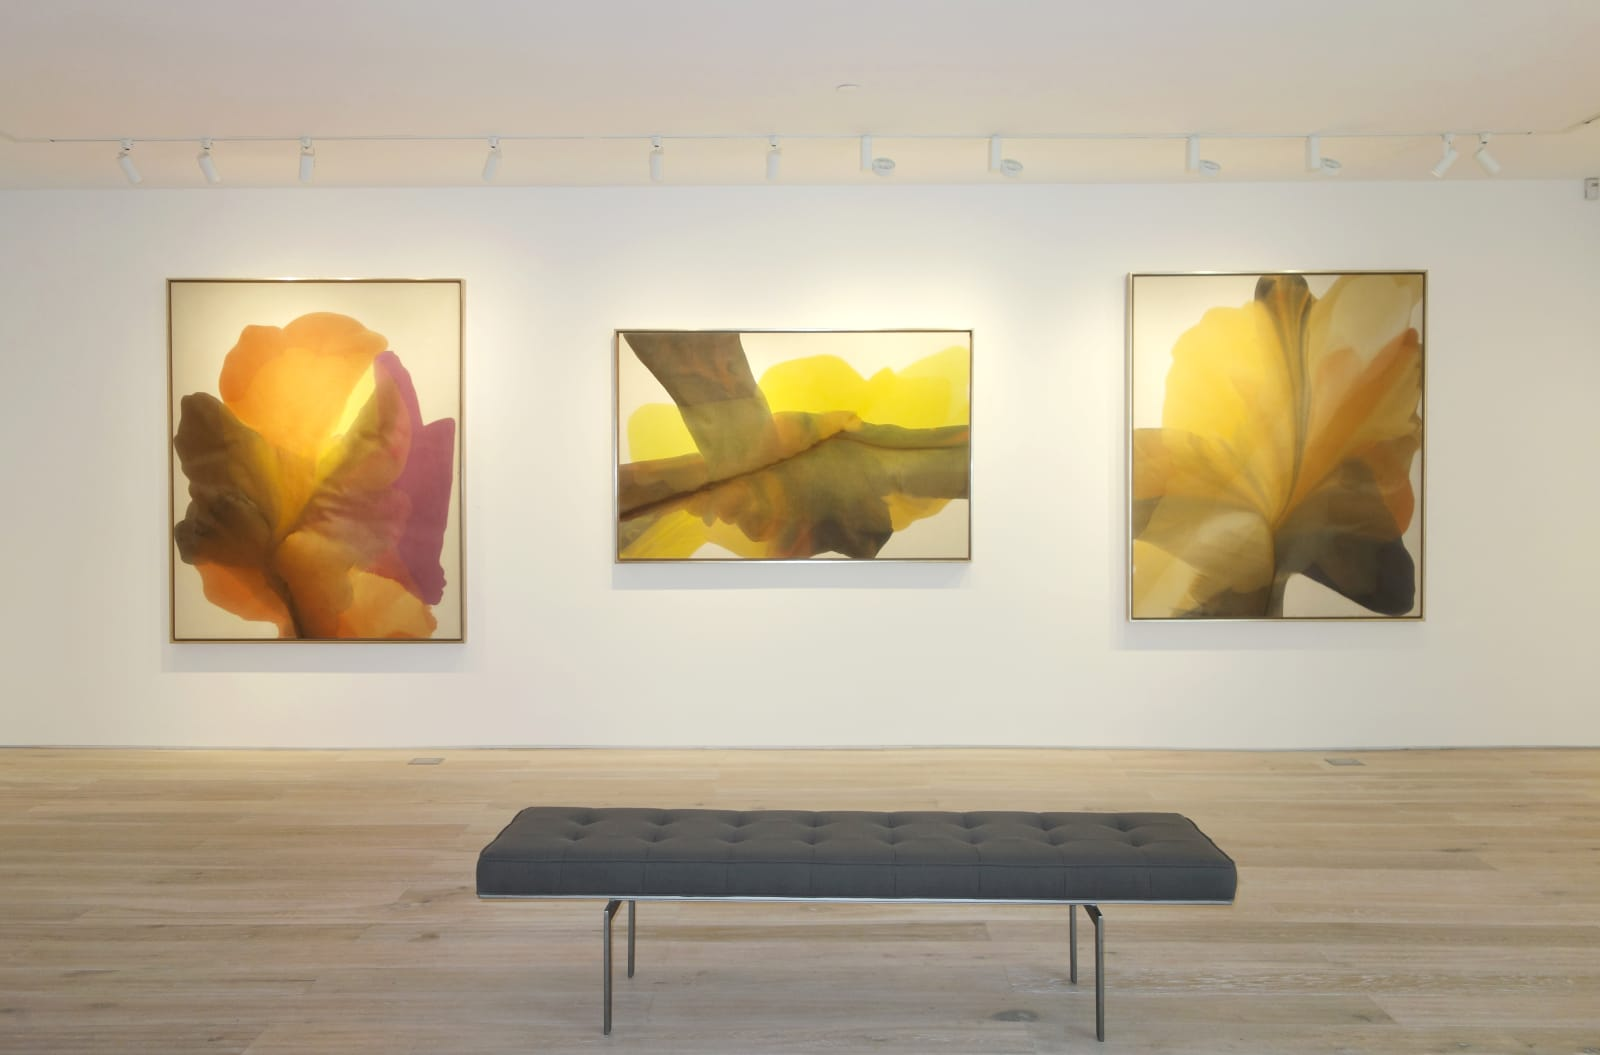 Installation view: Irene Monat Stern